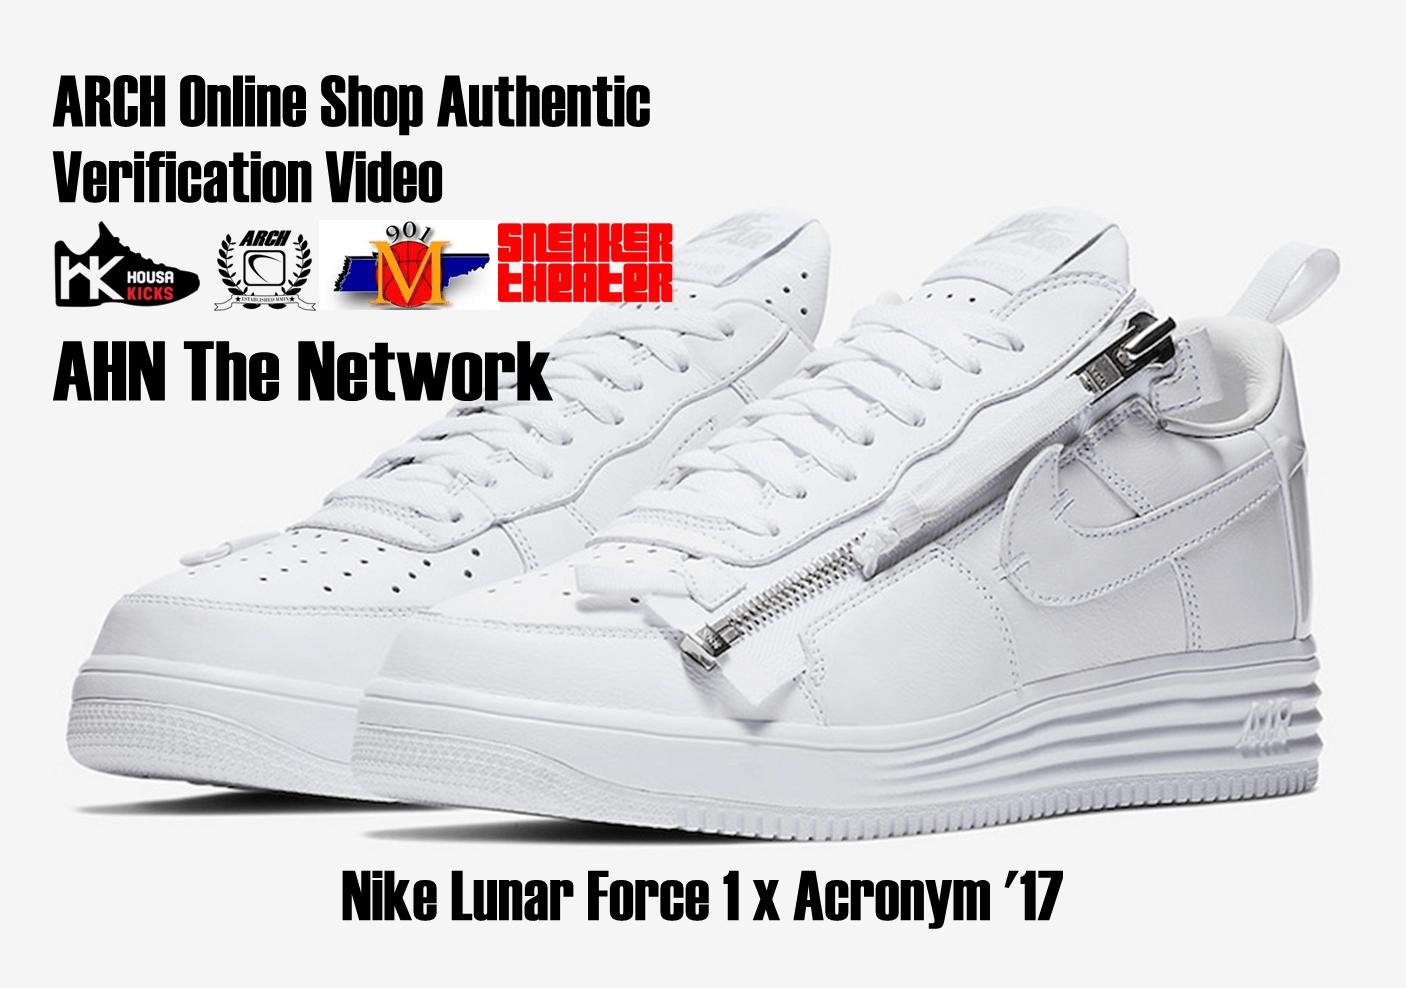 Nike Lunar Force 1 x Acronym '17 | Authentic Verification